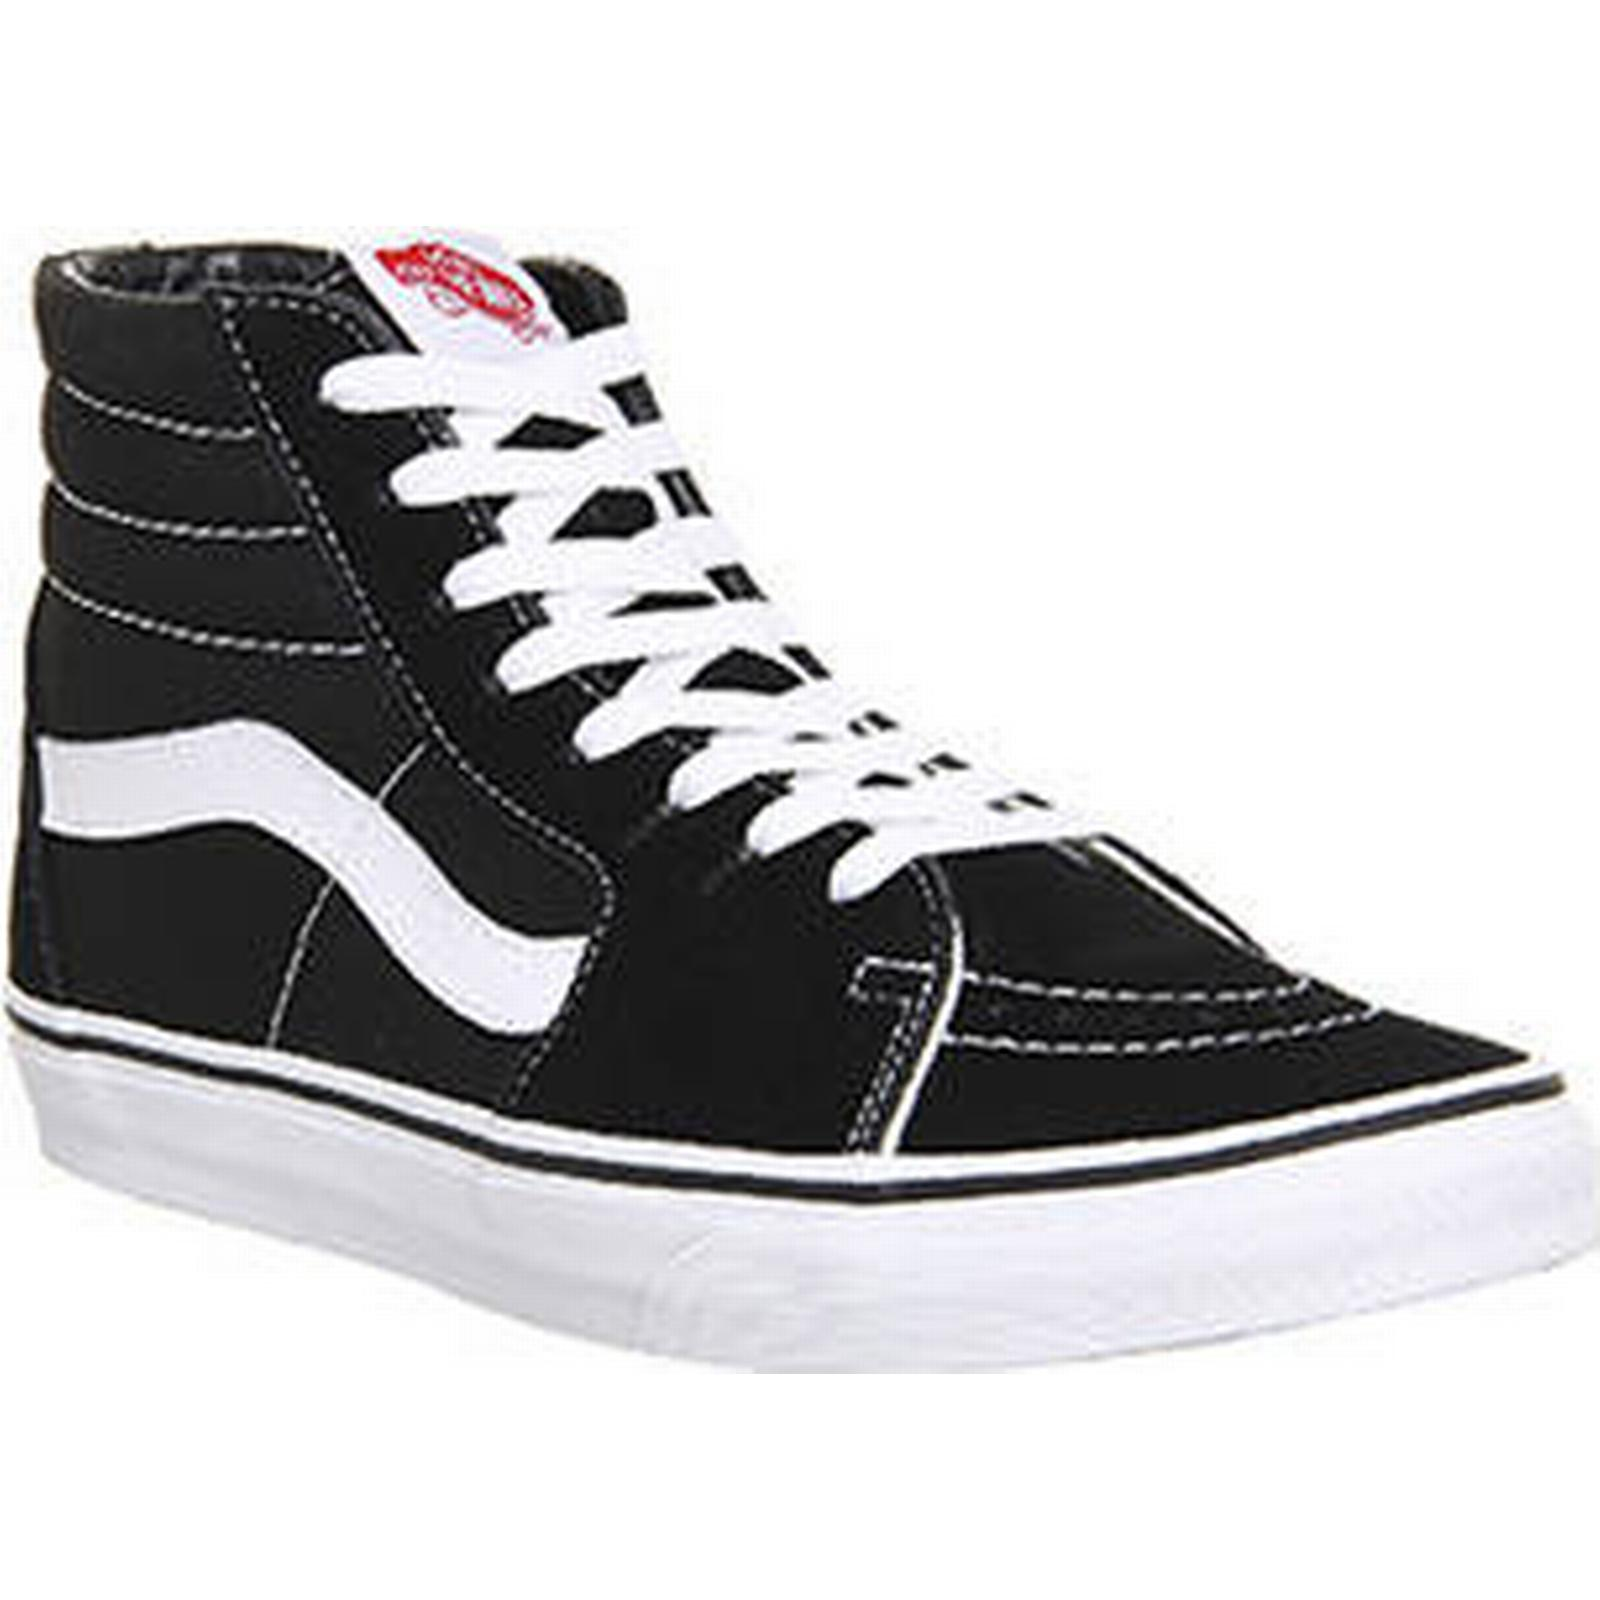 Vans Sk8 Hi BLACK WHITE WHITE BLACK CANVAS ca5cee